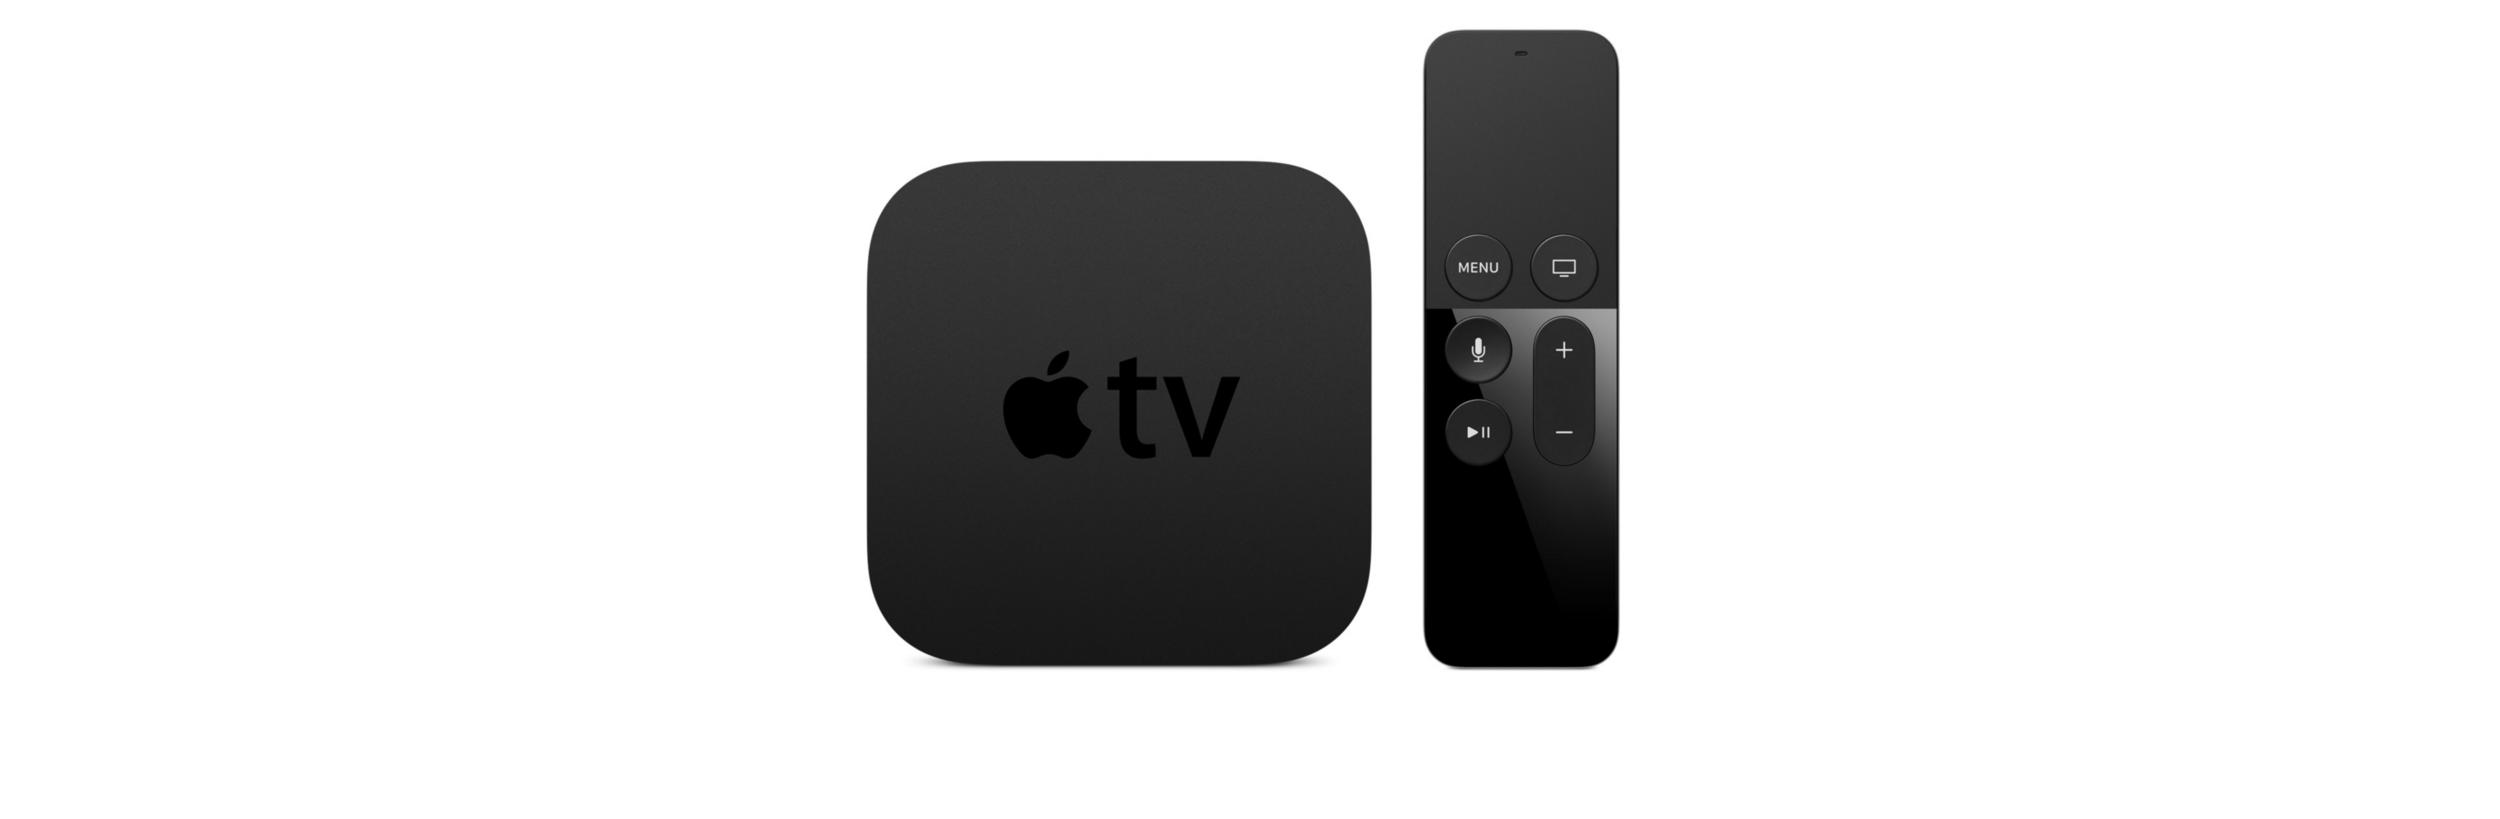 Apple-TV-Siri-Remote.jpg